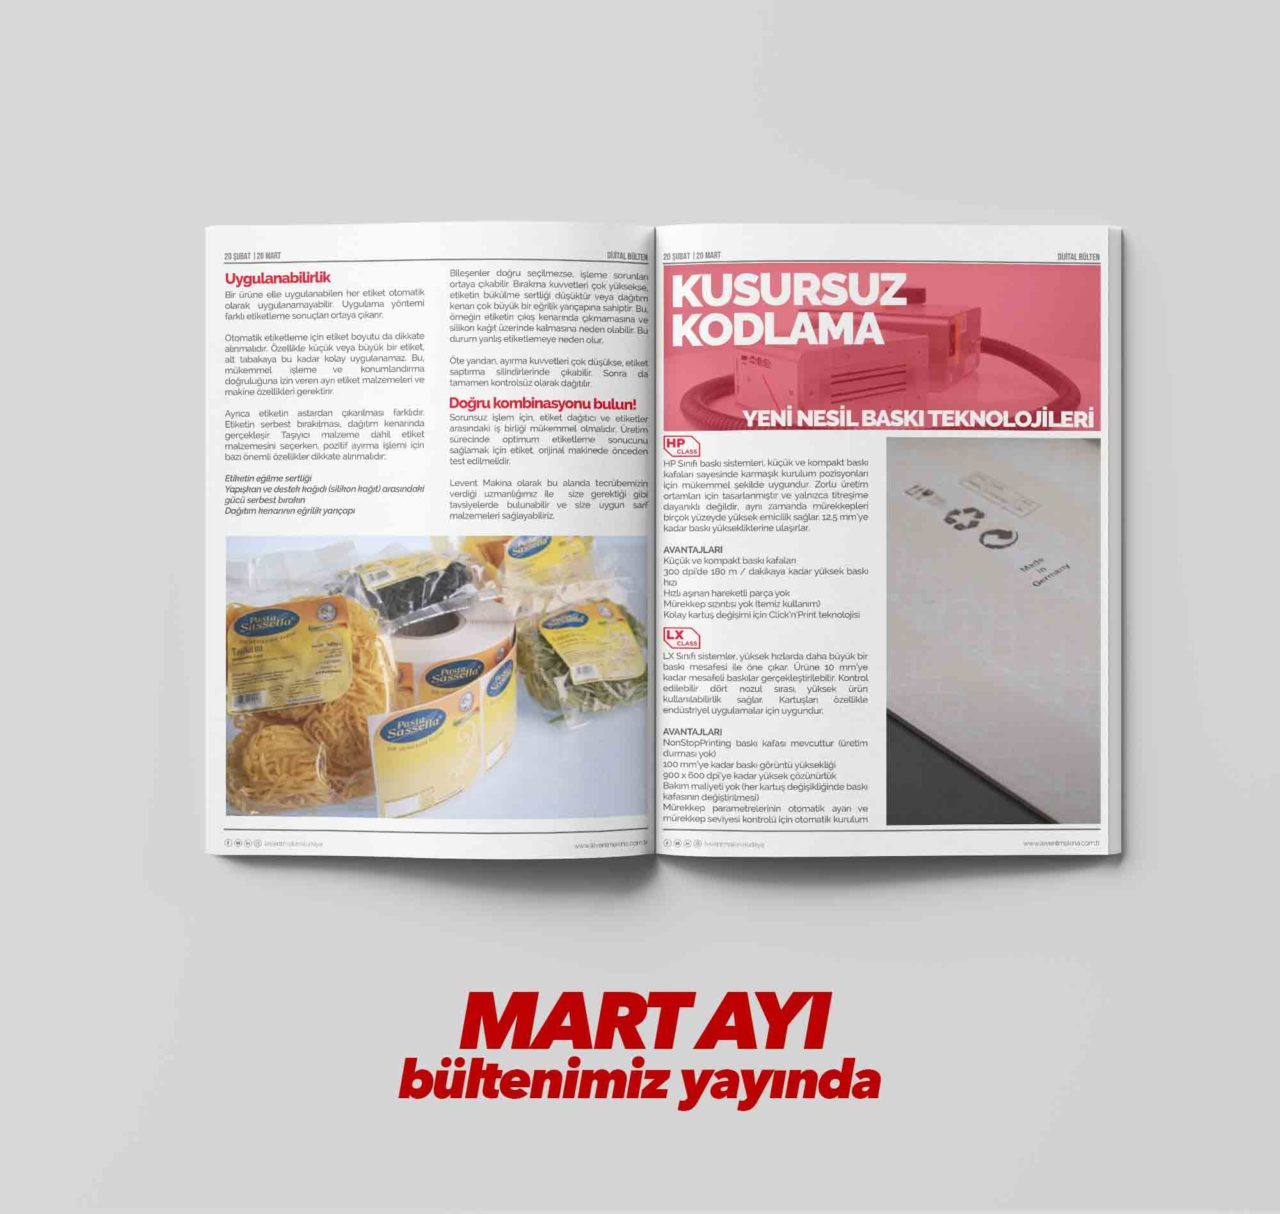 https://leventmakina.com.tr/wp-content/uploads/2021/03/Bulten-Levent-Makina-1280x1214.jpg